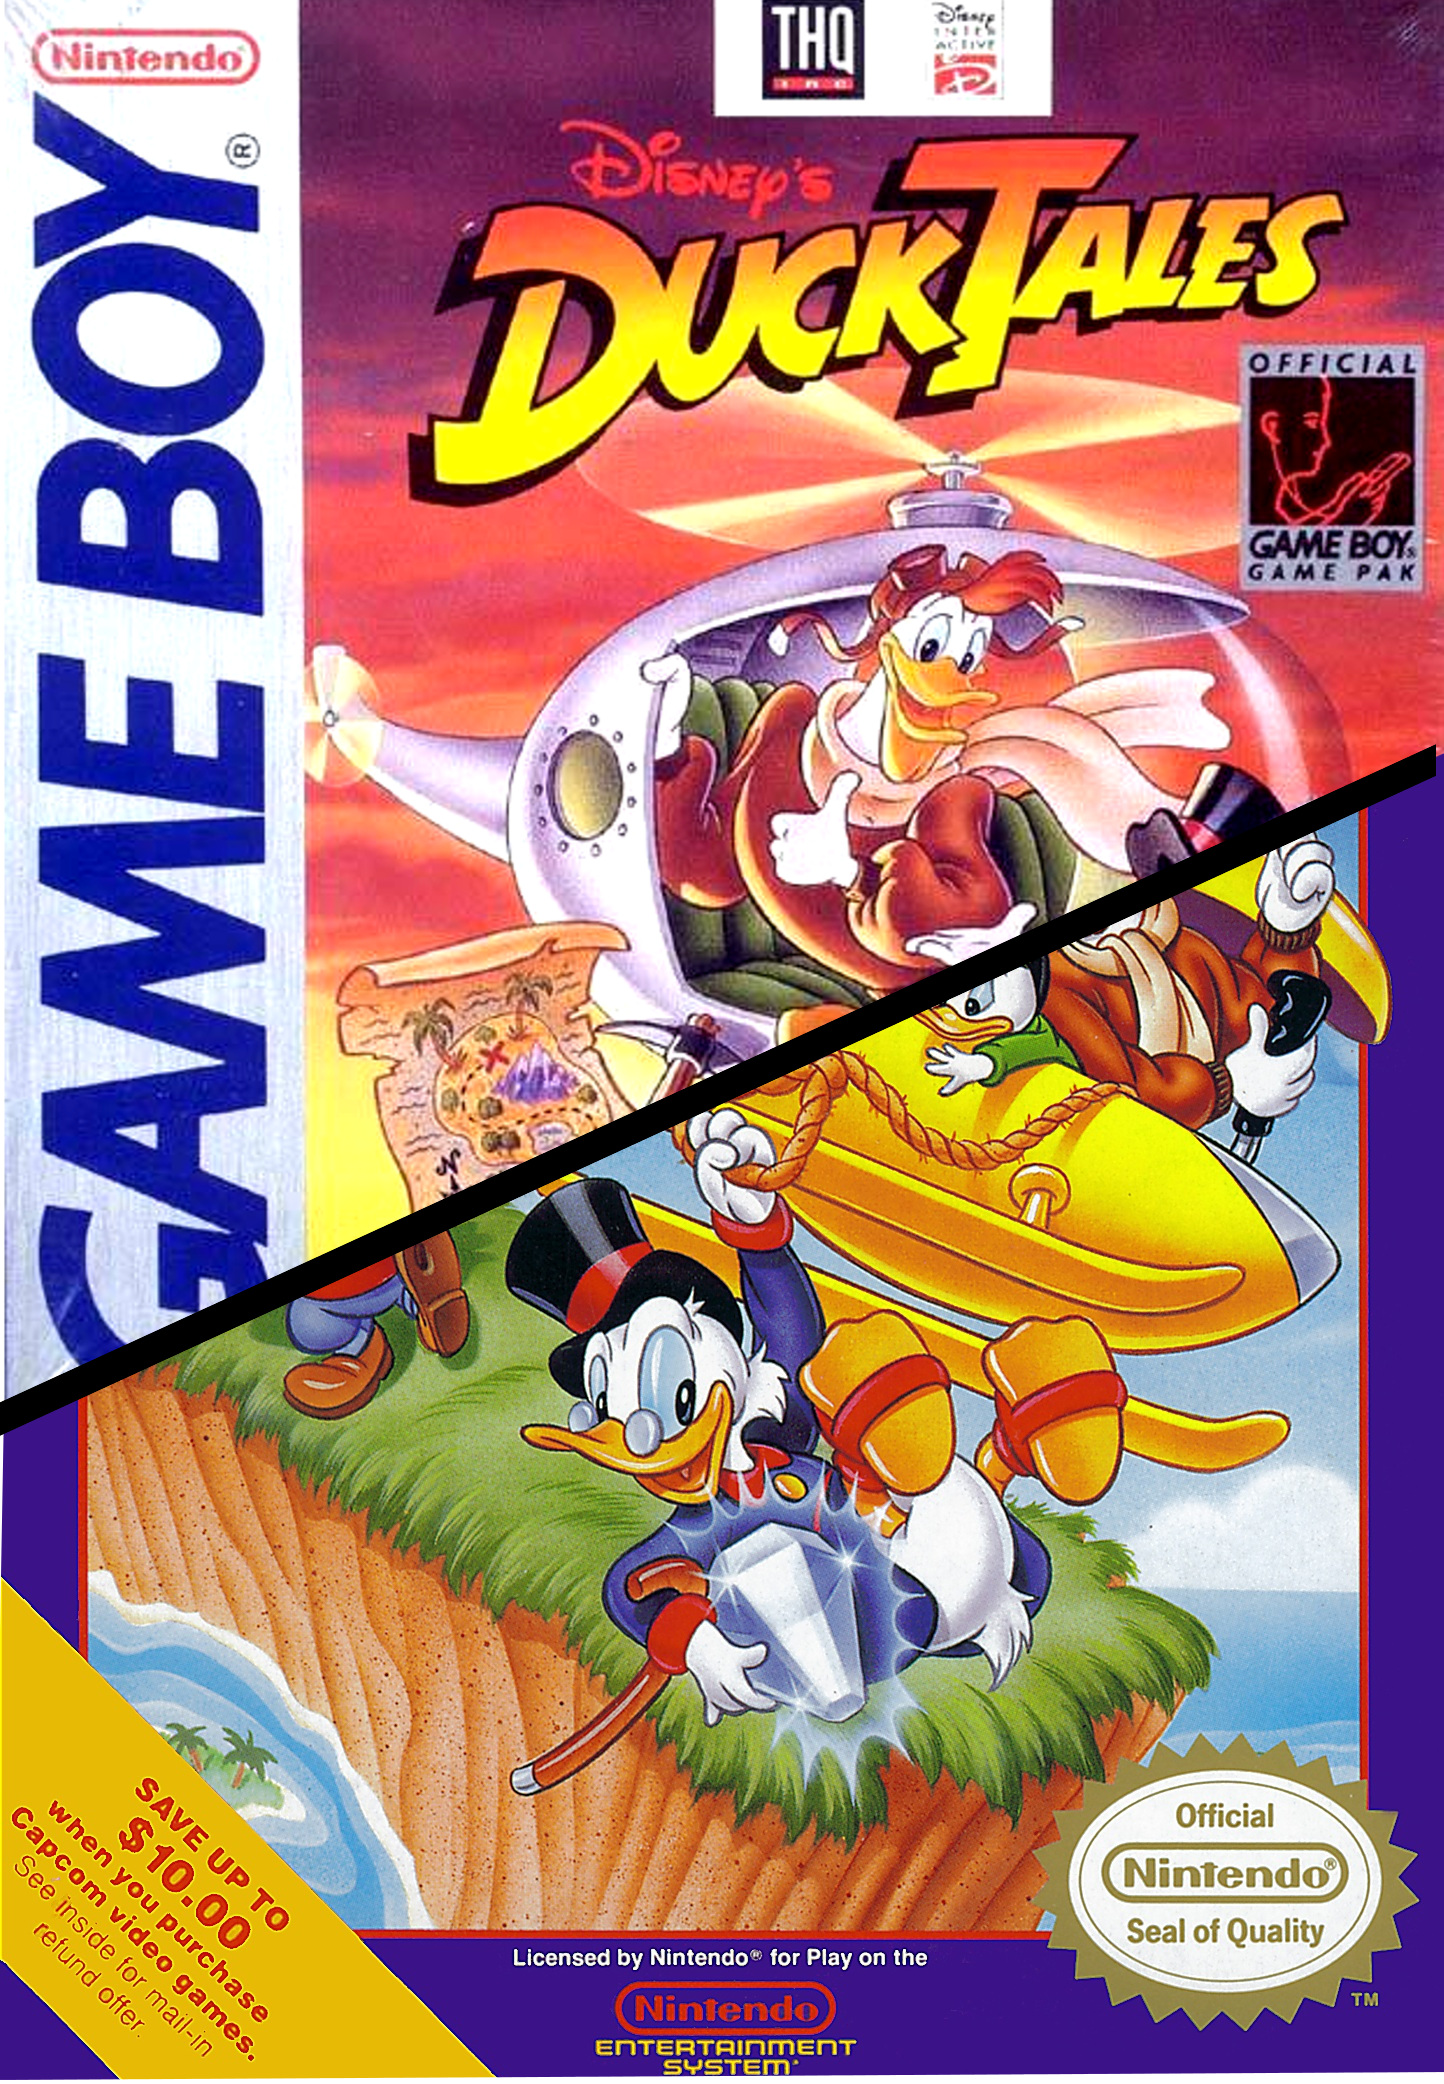 SplitscreeN One Game Two Versions DuckTales GB Vs